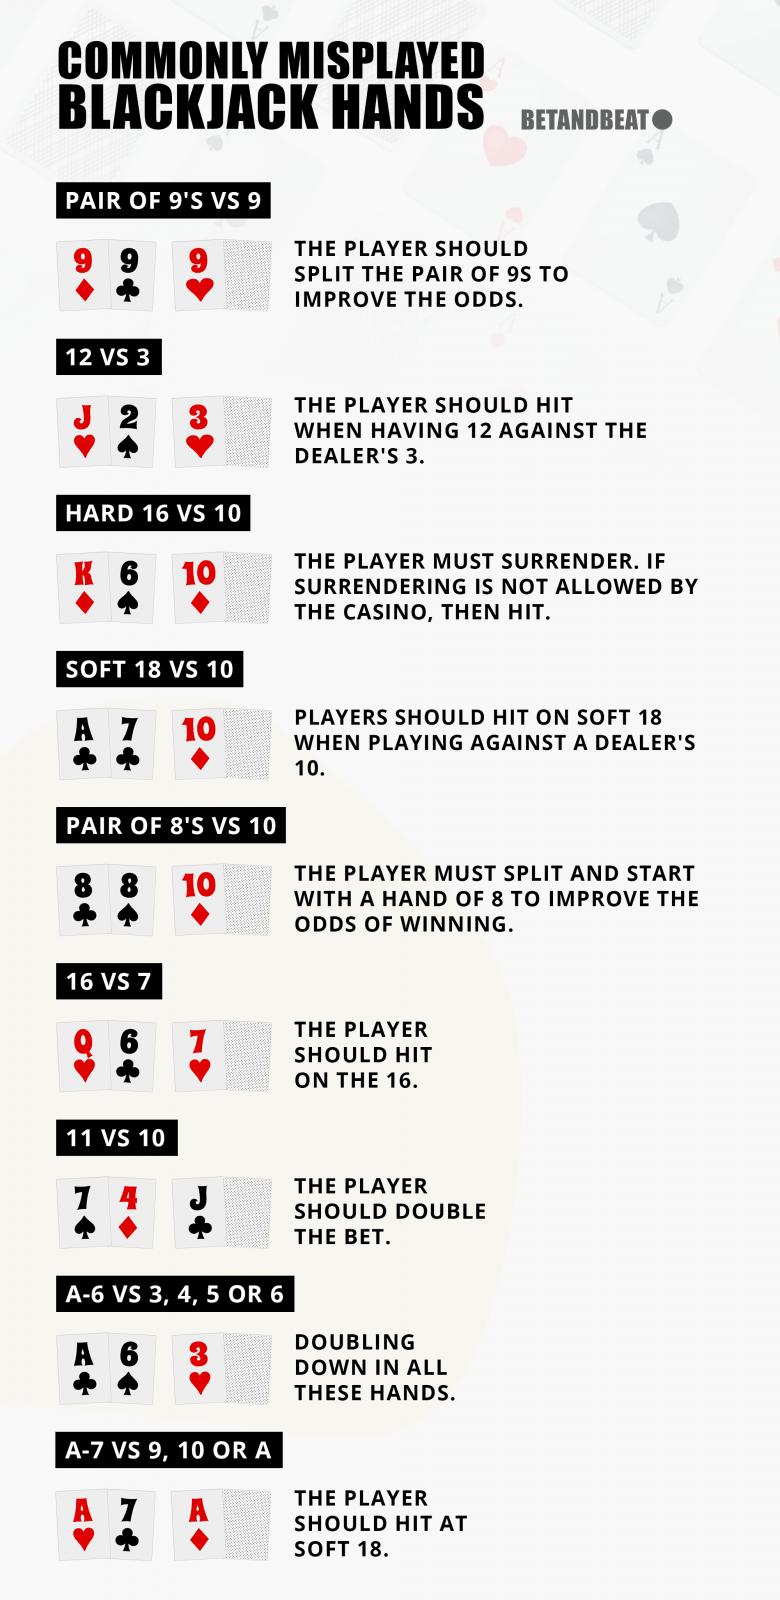 most common misplayed blackjack hands